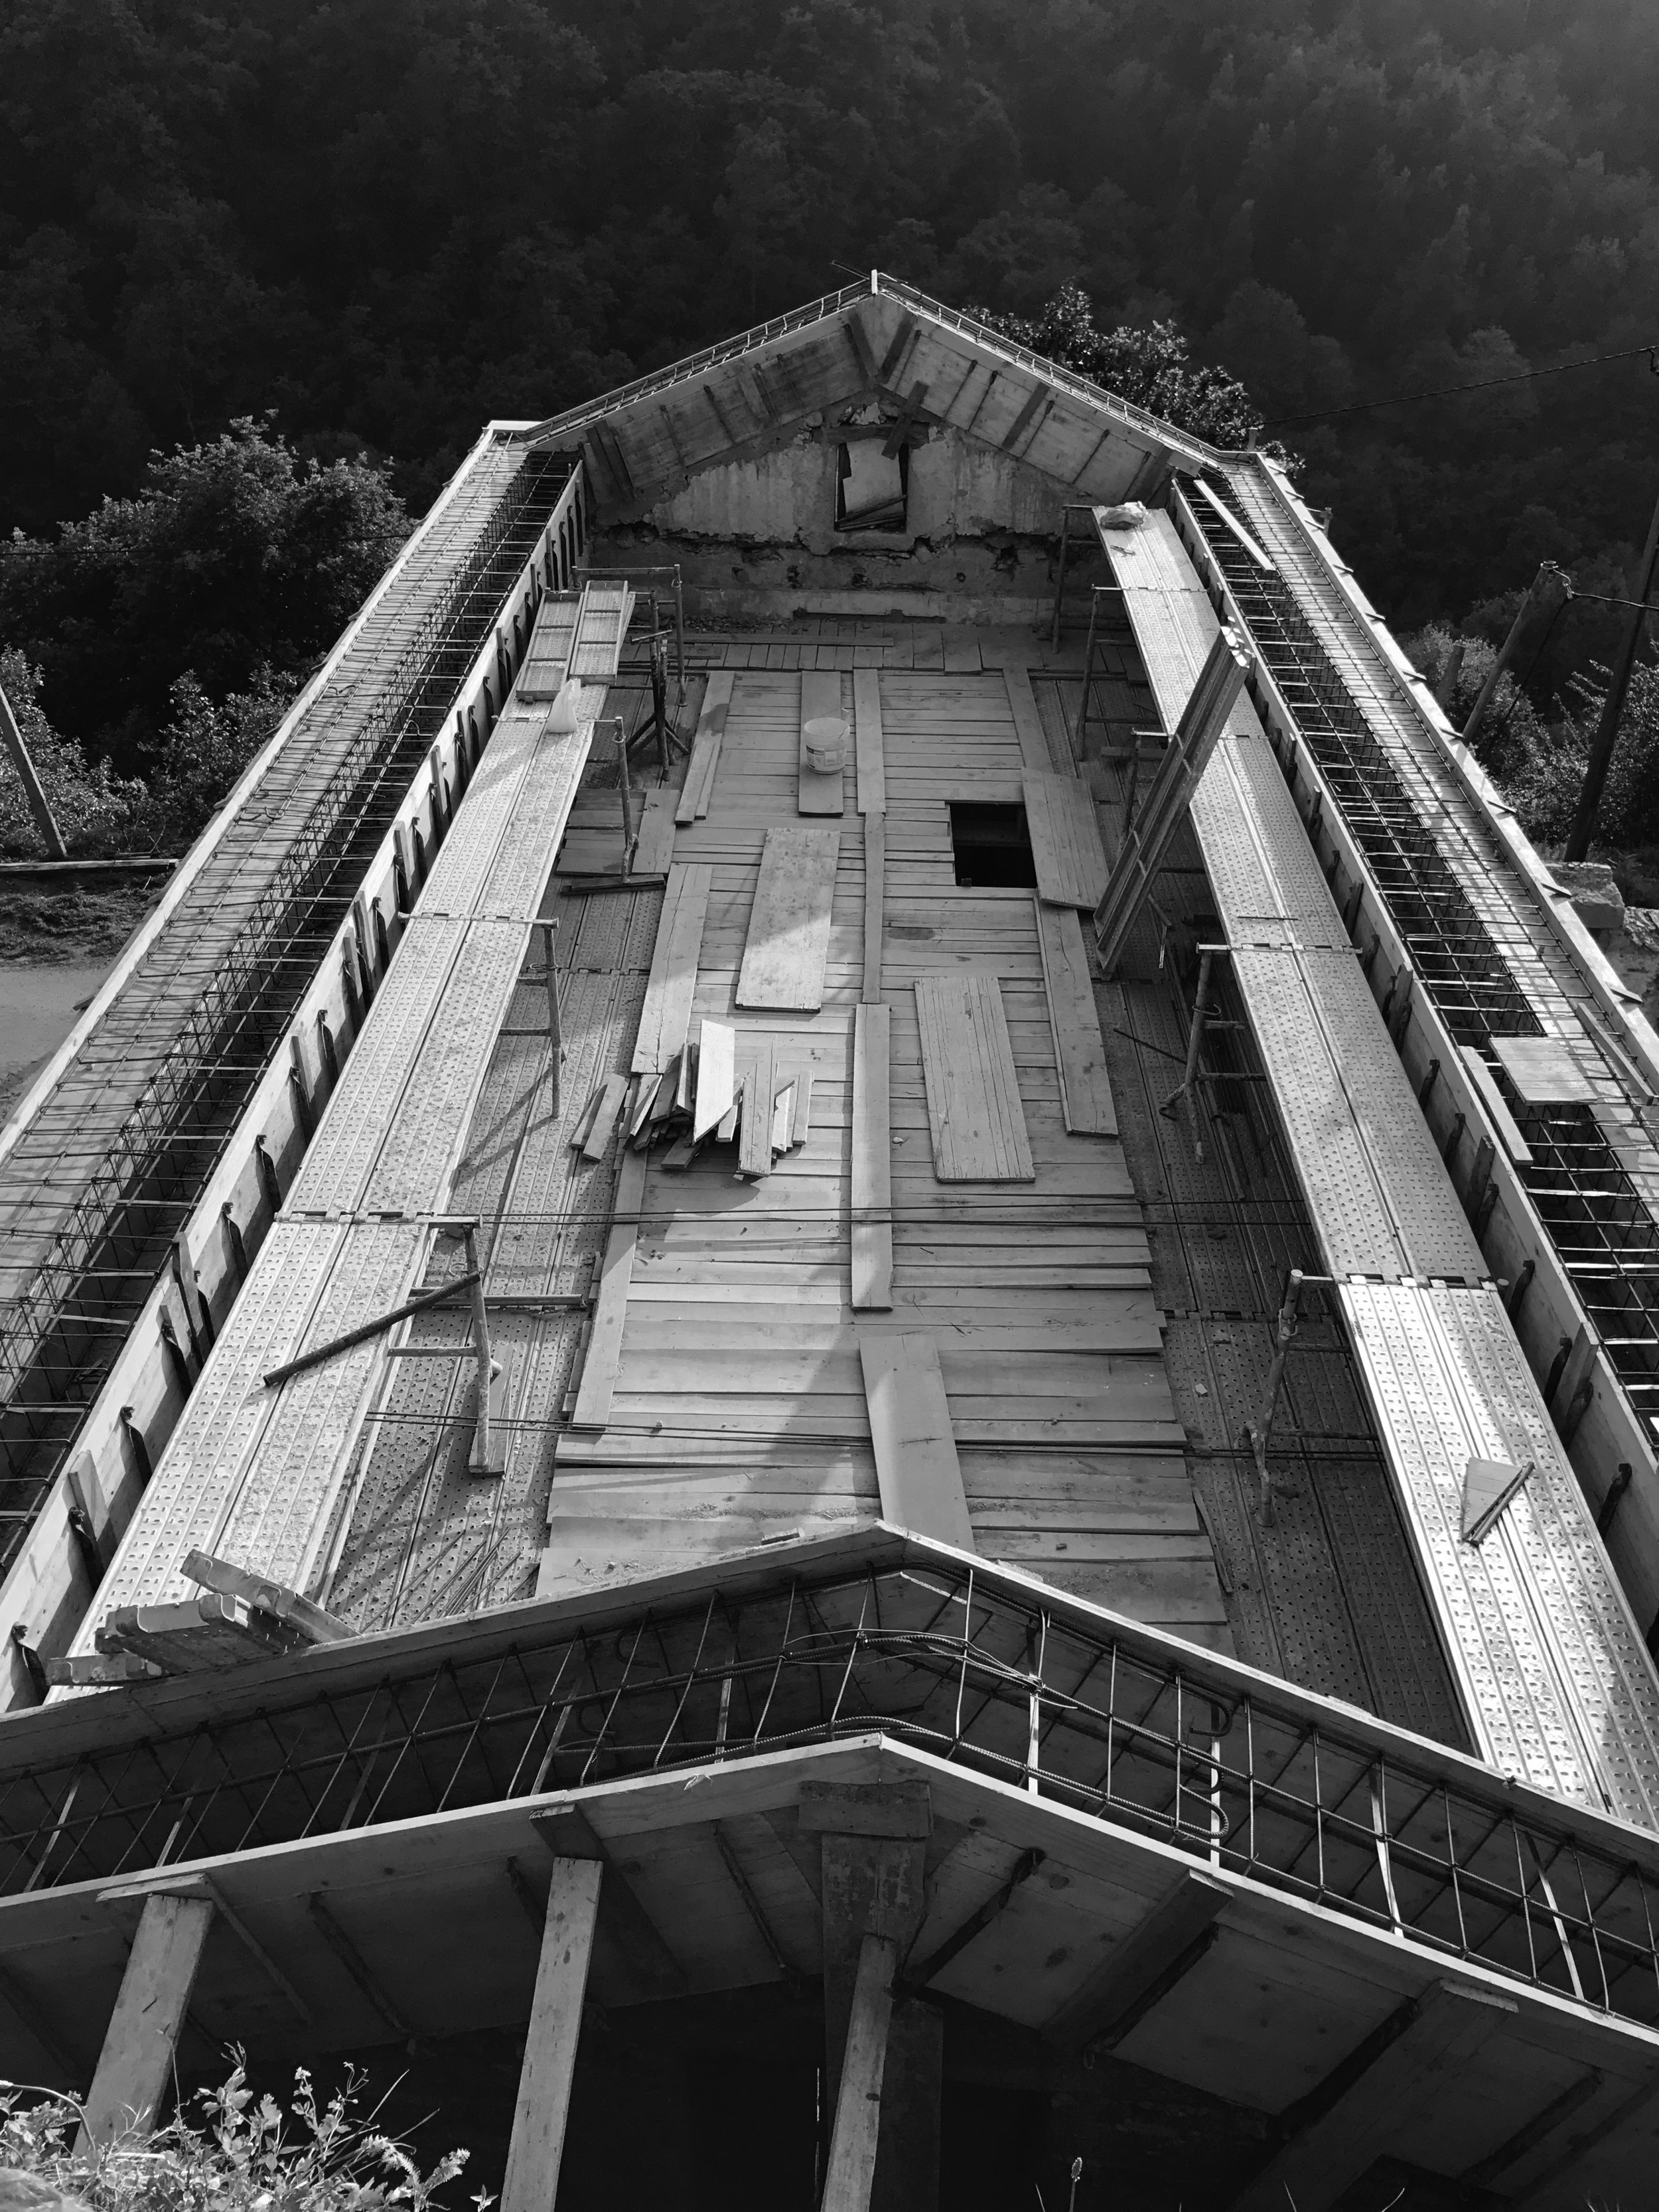 Moradia Folgorosa - Vale de Cambra - EVA atelier - Arquitectura - Obra - Arquitecto - Porto - EVA evolutionary architecture (15).jpg